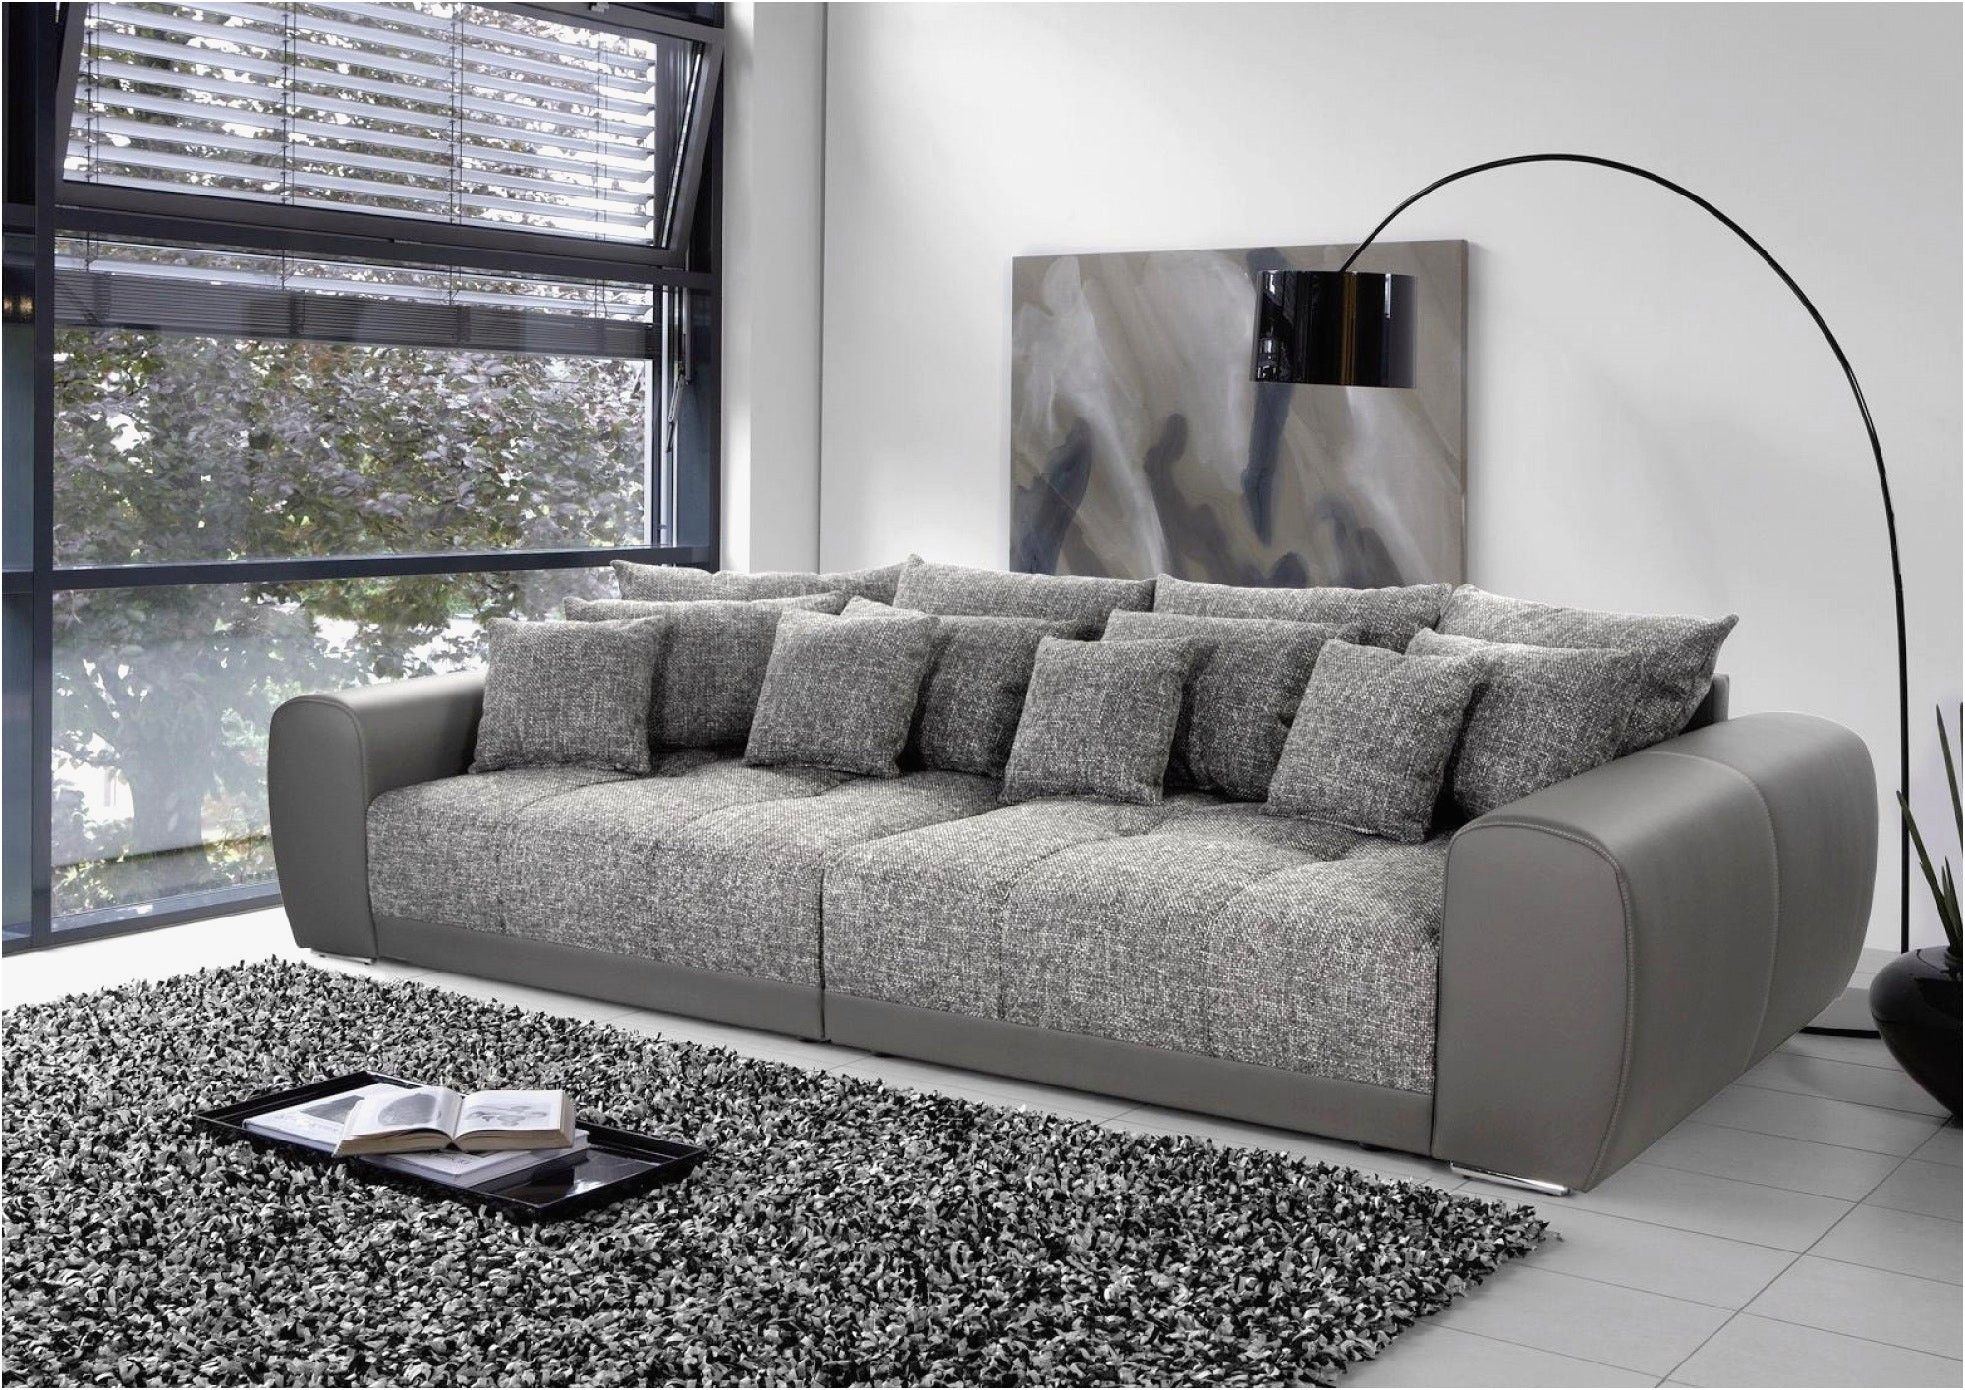 Angenehm Vintage Sofa Gunstig Modern Couch Vintage Sofa Canape Sofa